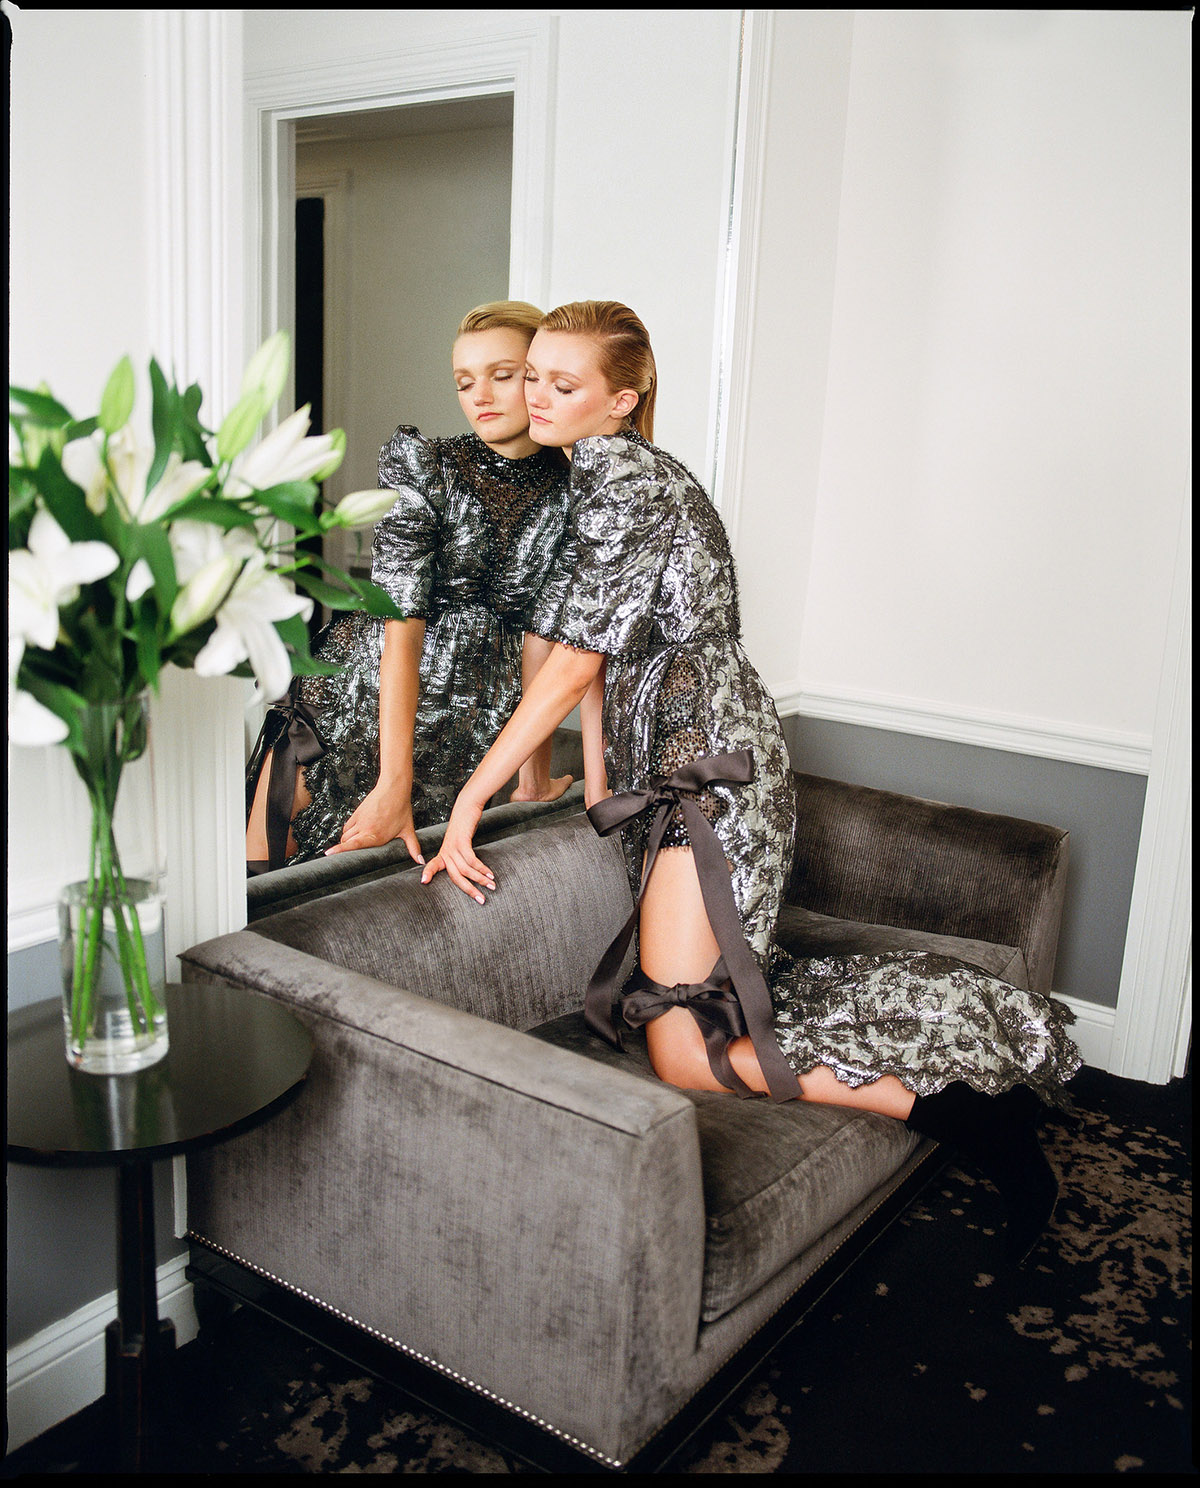 Photography by   Cesar Love Alexandre     Fashion by     Esteban Pomar     Produced by   Jaime Aguilera   MUA by   Natalia Mejia     Hair by     Yasu Nakamura   Model   Peyton Knight     at     New York Model Management